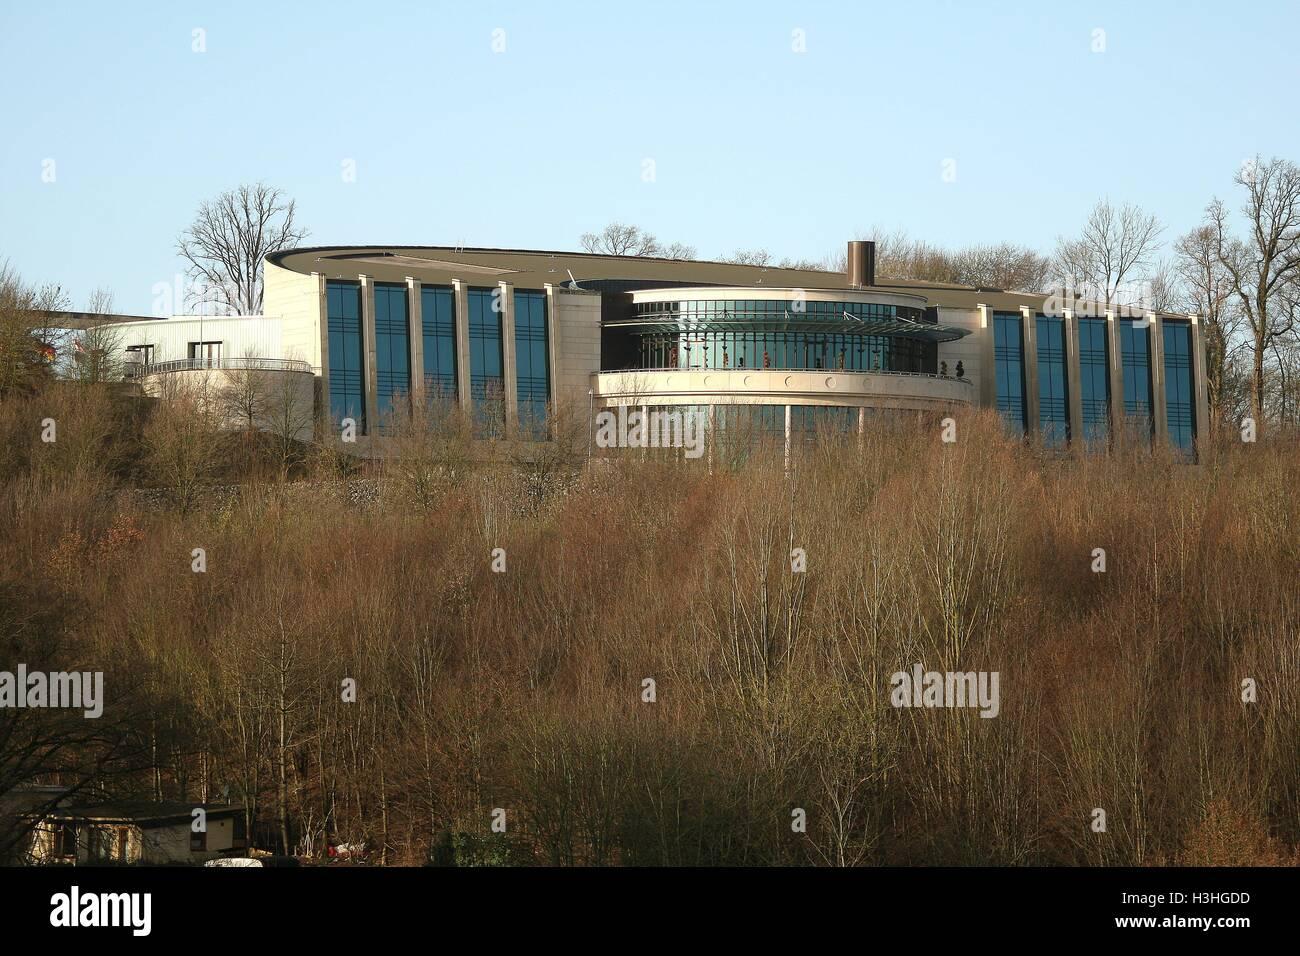 Holland Casino building on Cauberg in the market city of Valkenburg South Holland Limburg Netherlands NL 2016 - Stock Image